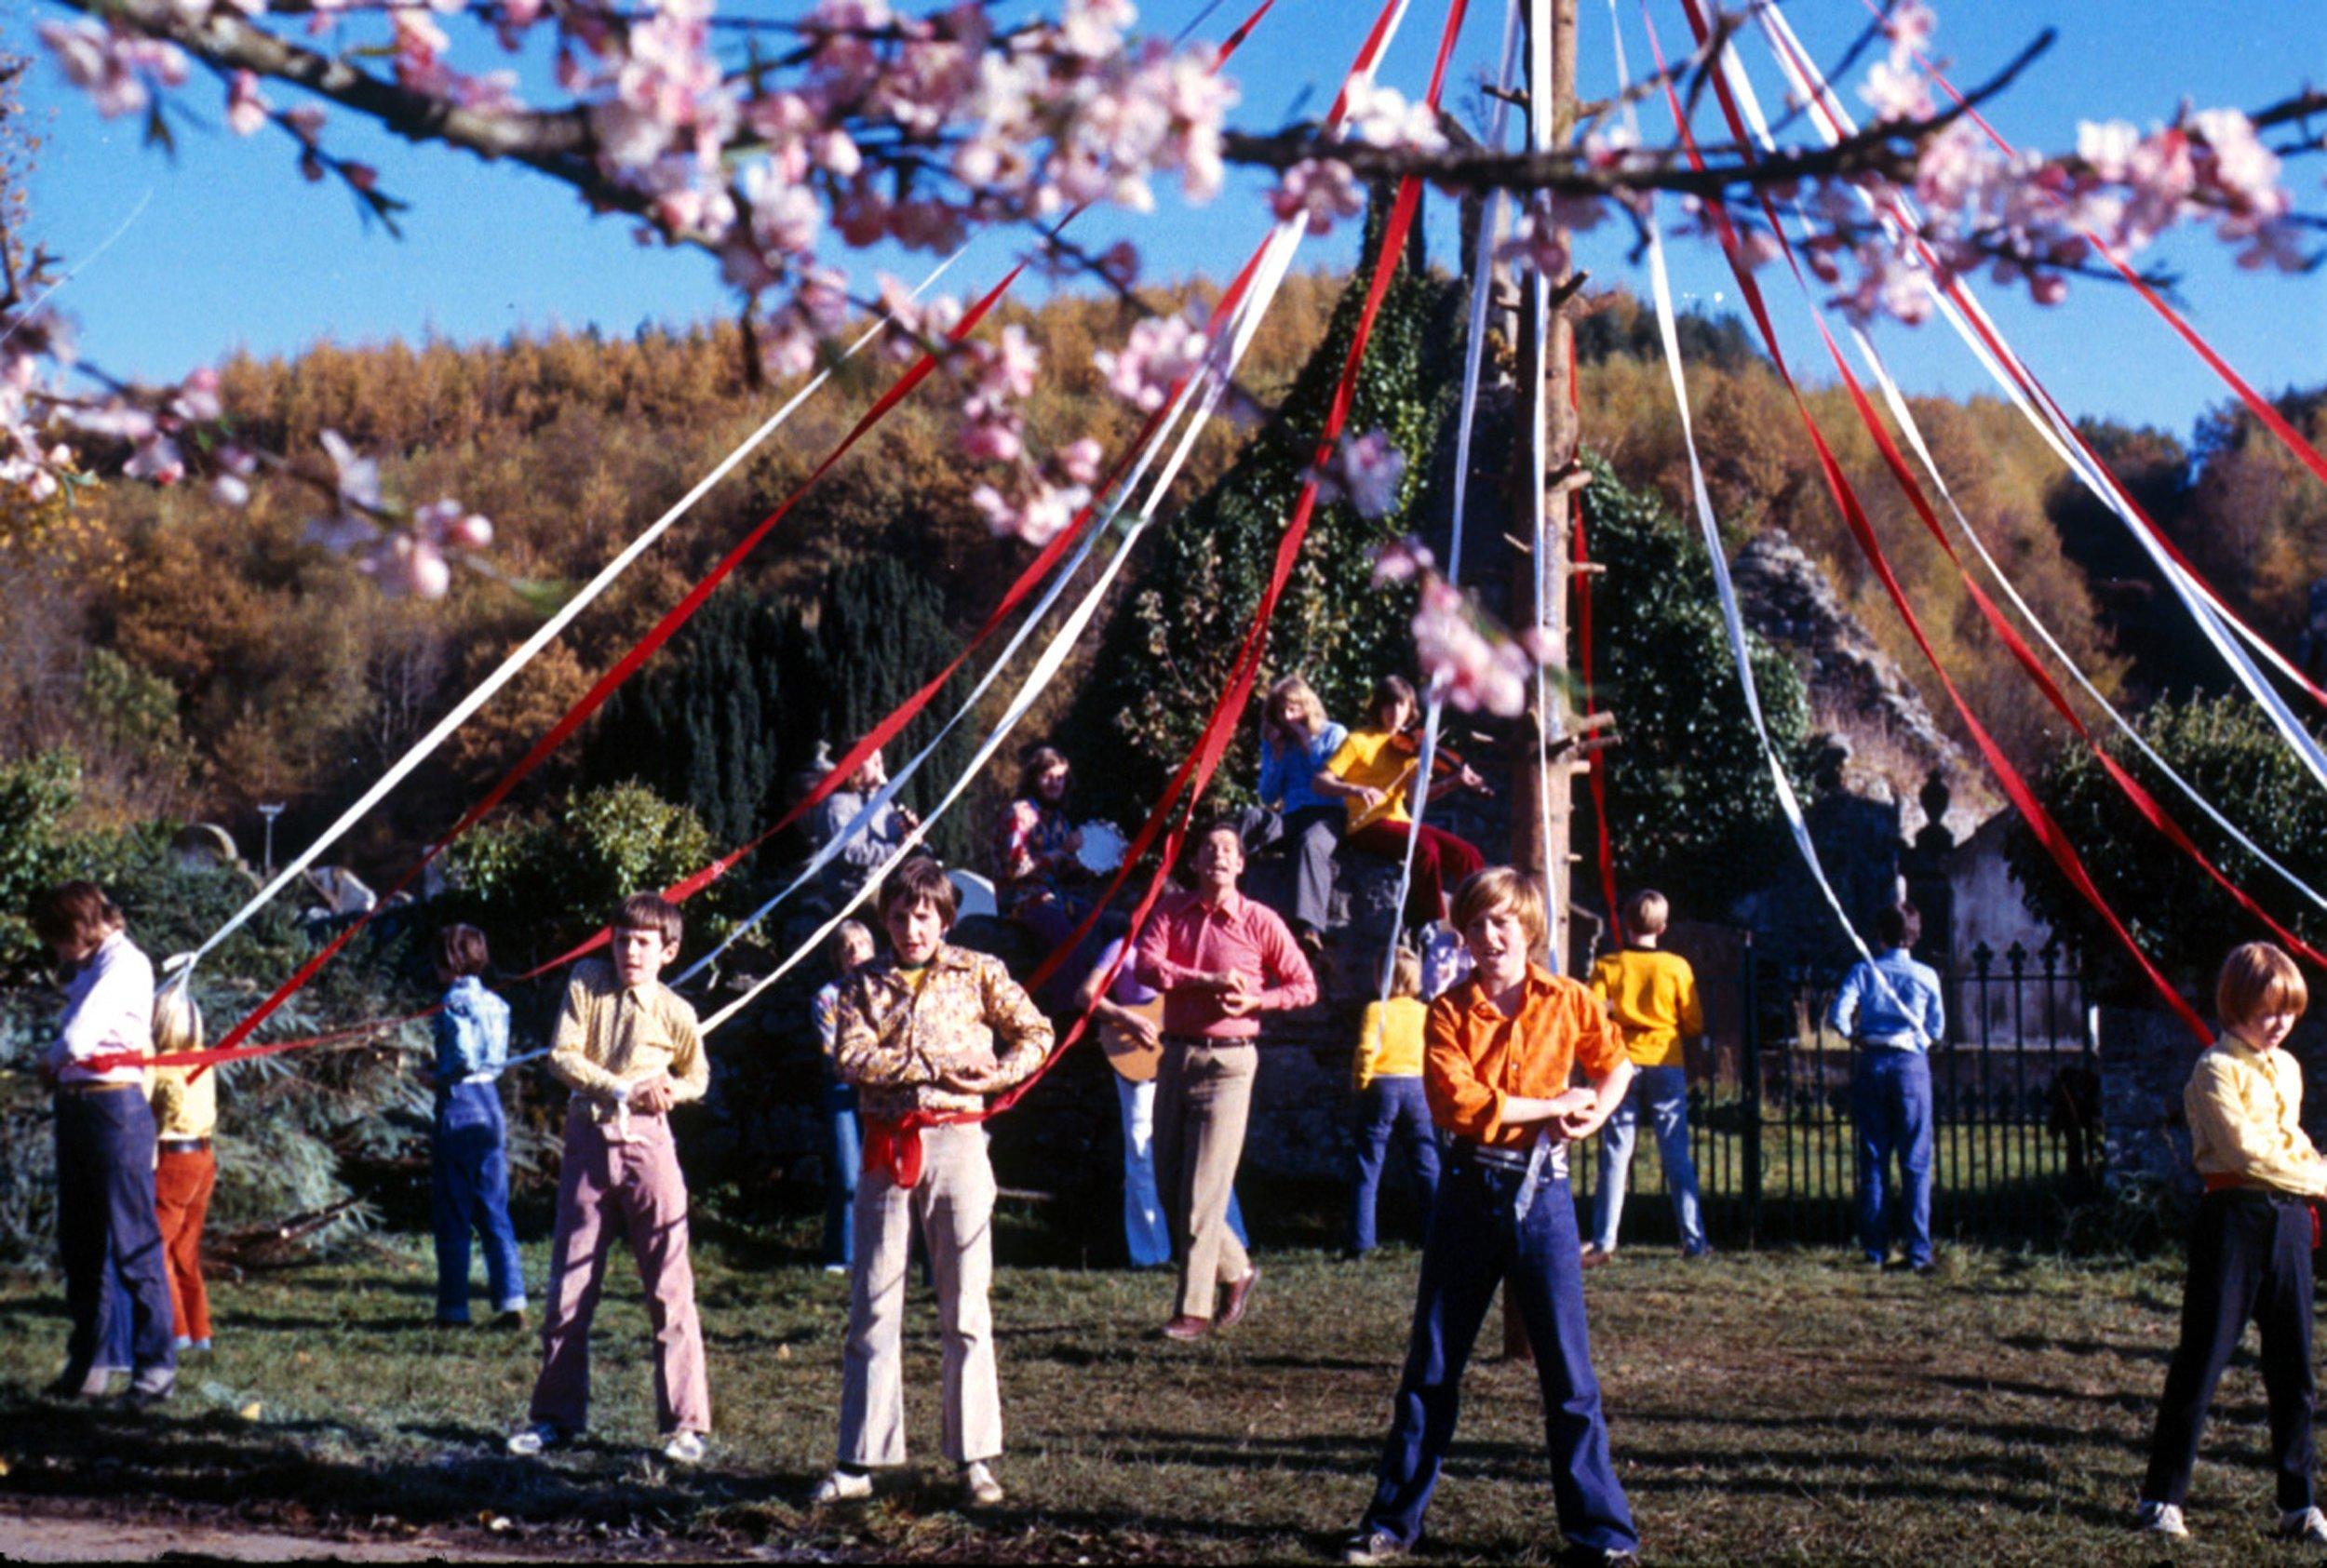 The Maypole scene from The Wicker Man (1973)